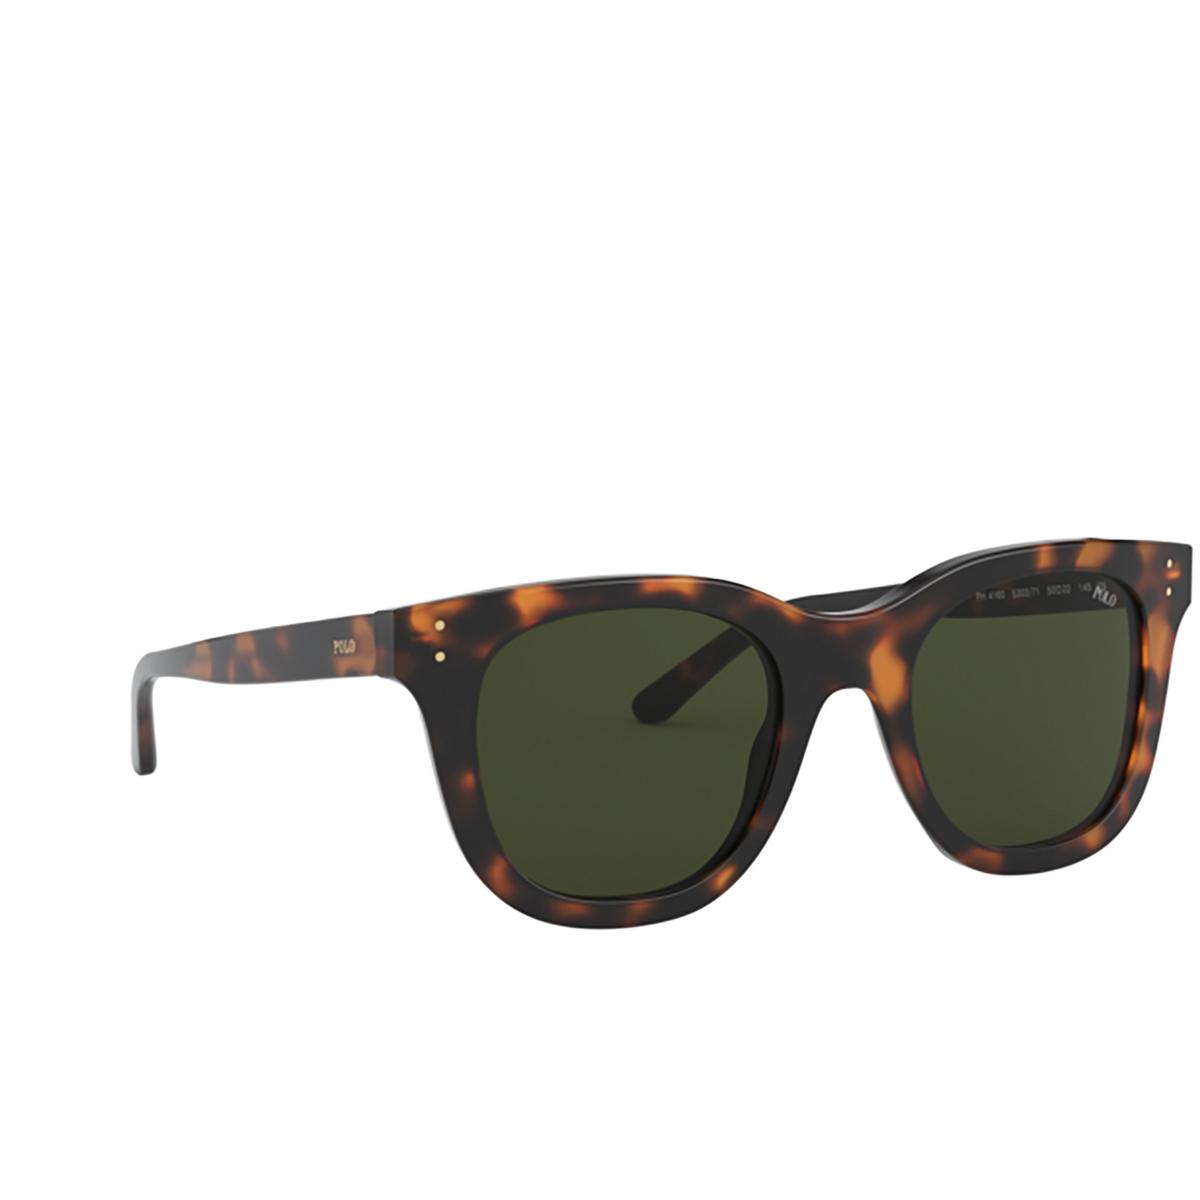 Polo Ralph Lauren® Square Sunglasses: PH4160 color Shiny Jc Tortoise 530371.